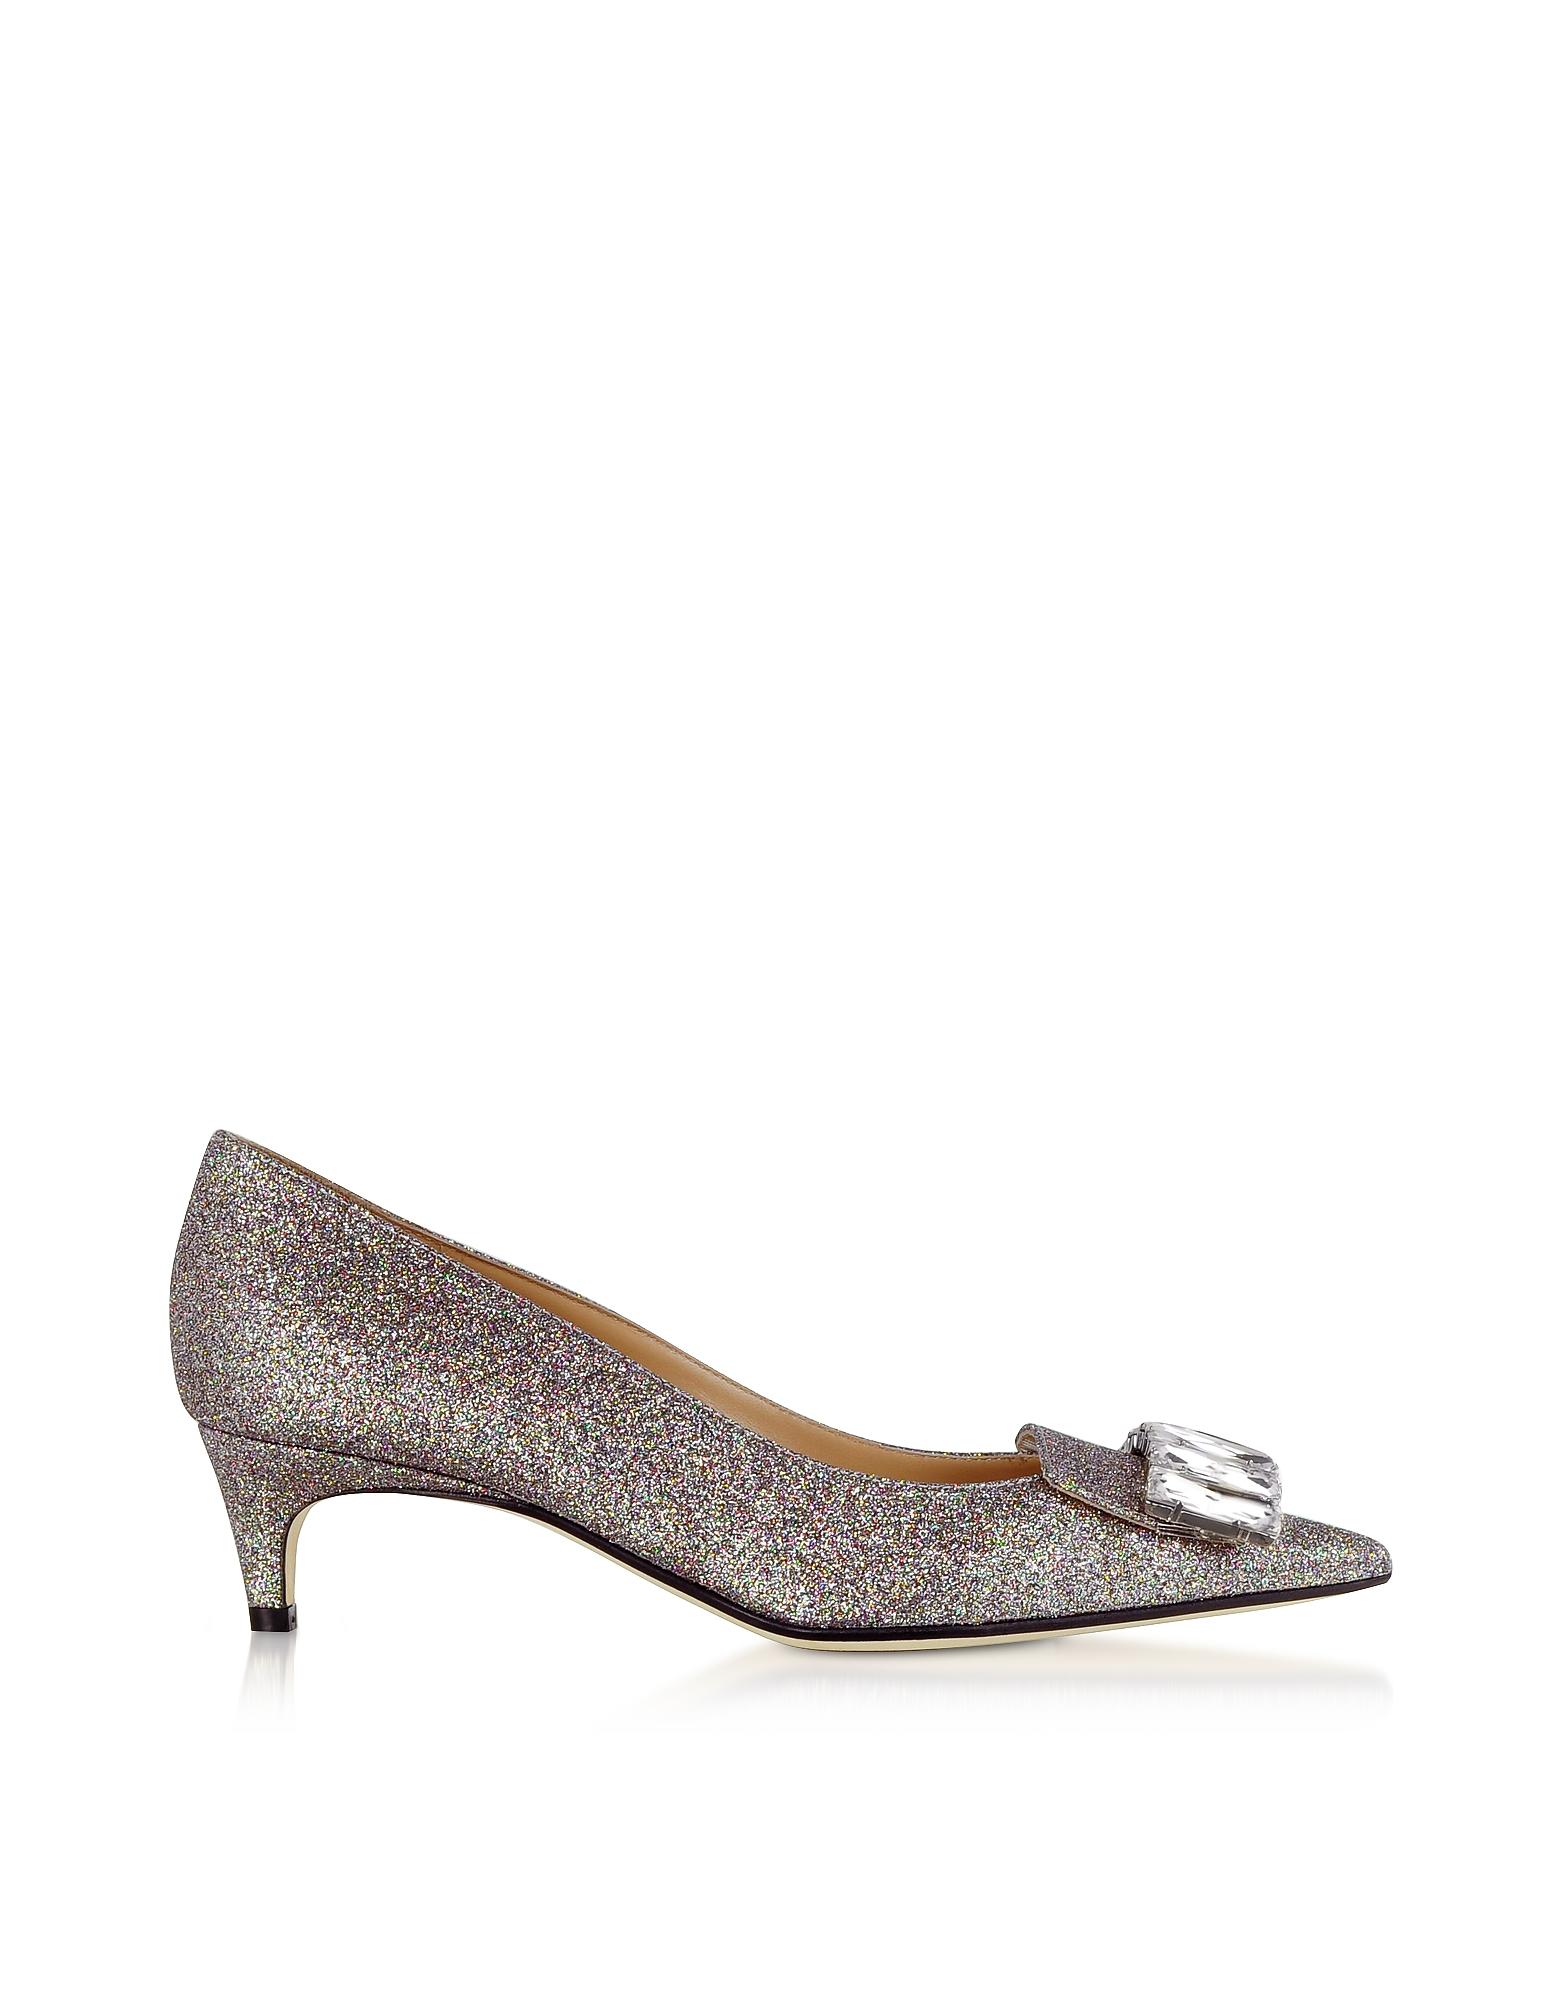 Sergio Rossi Designer Shoes, Glitterama Silver Mid-Heel Pumps